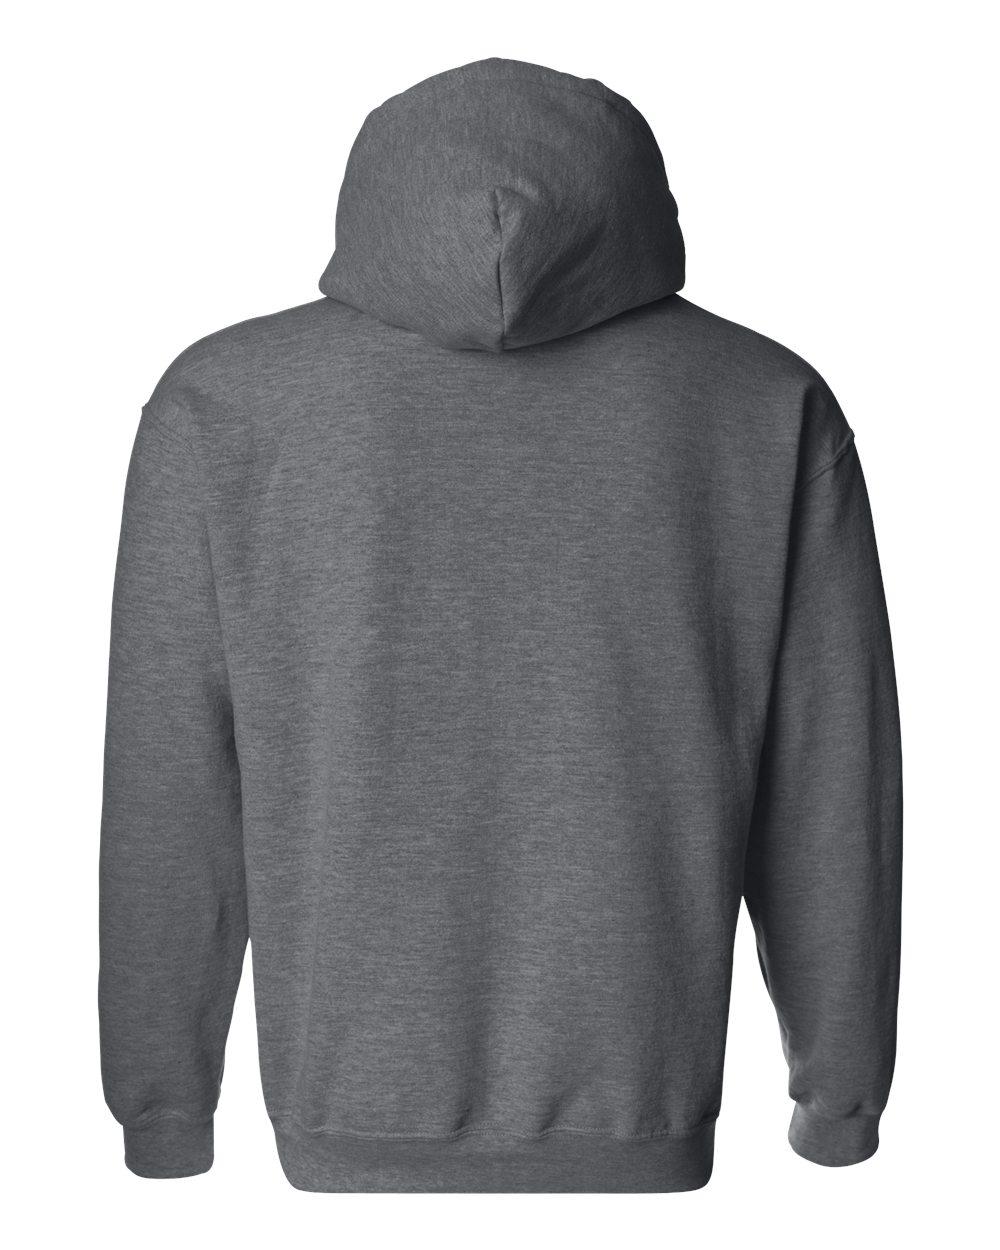 Gildan-Mens-Blank-Hoodie-Heavy-Blend-Hooded-Sweatshirt-18500-up-to-5XL thumbnail 16